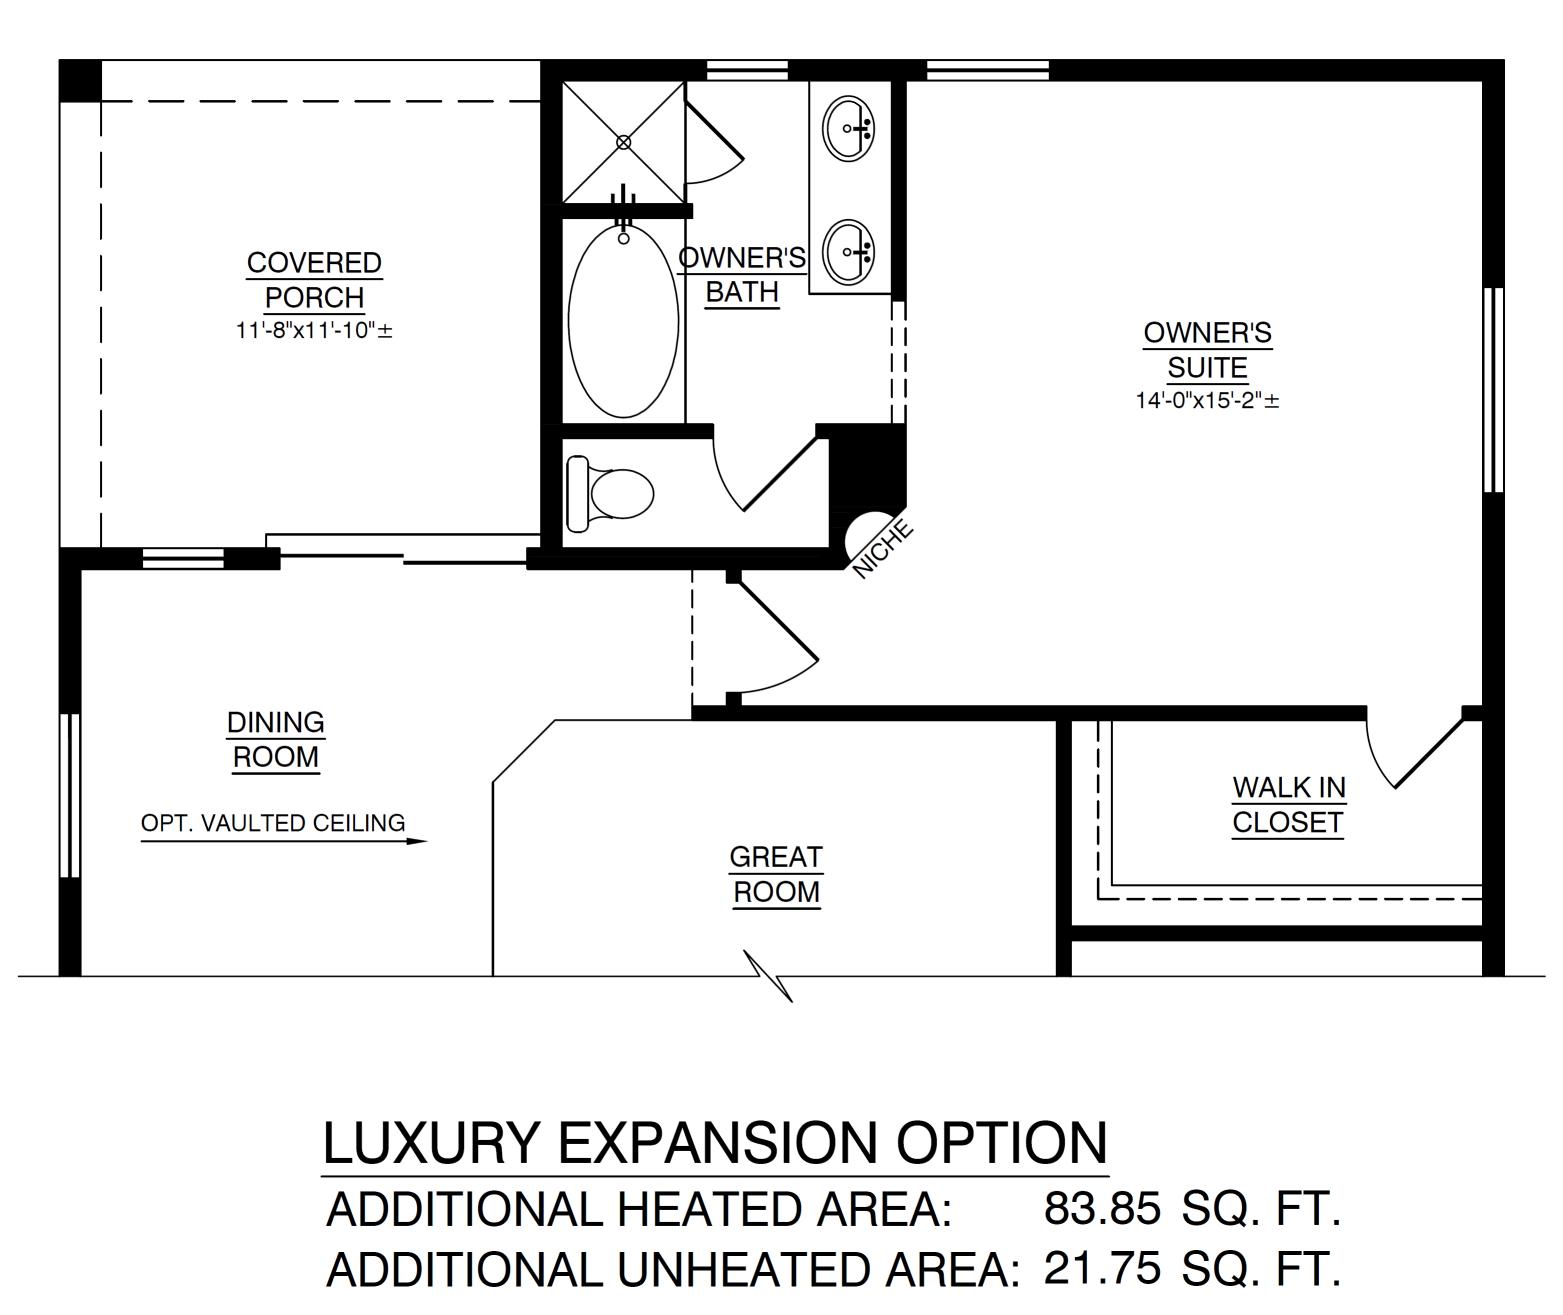 Optional Luxury Expansion